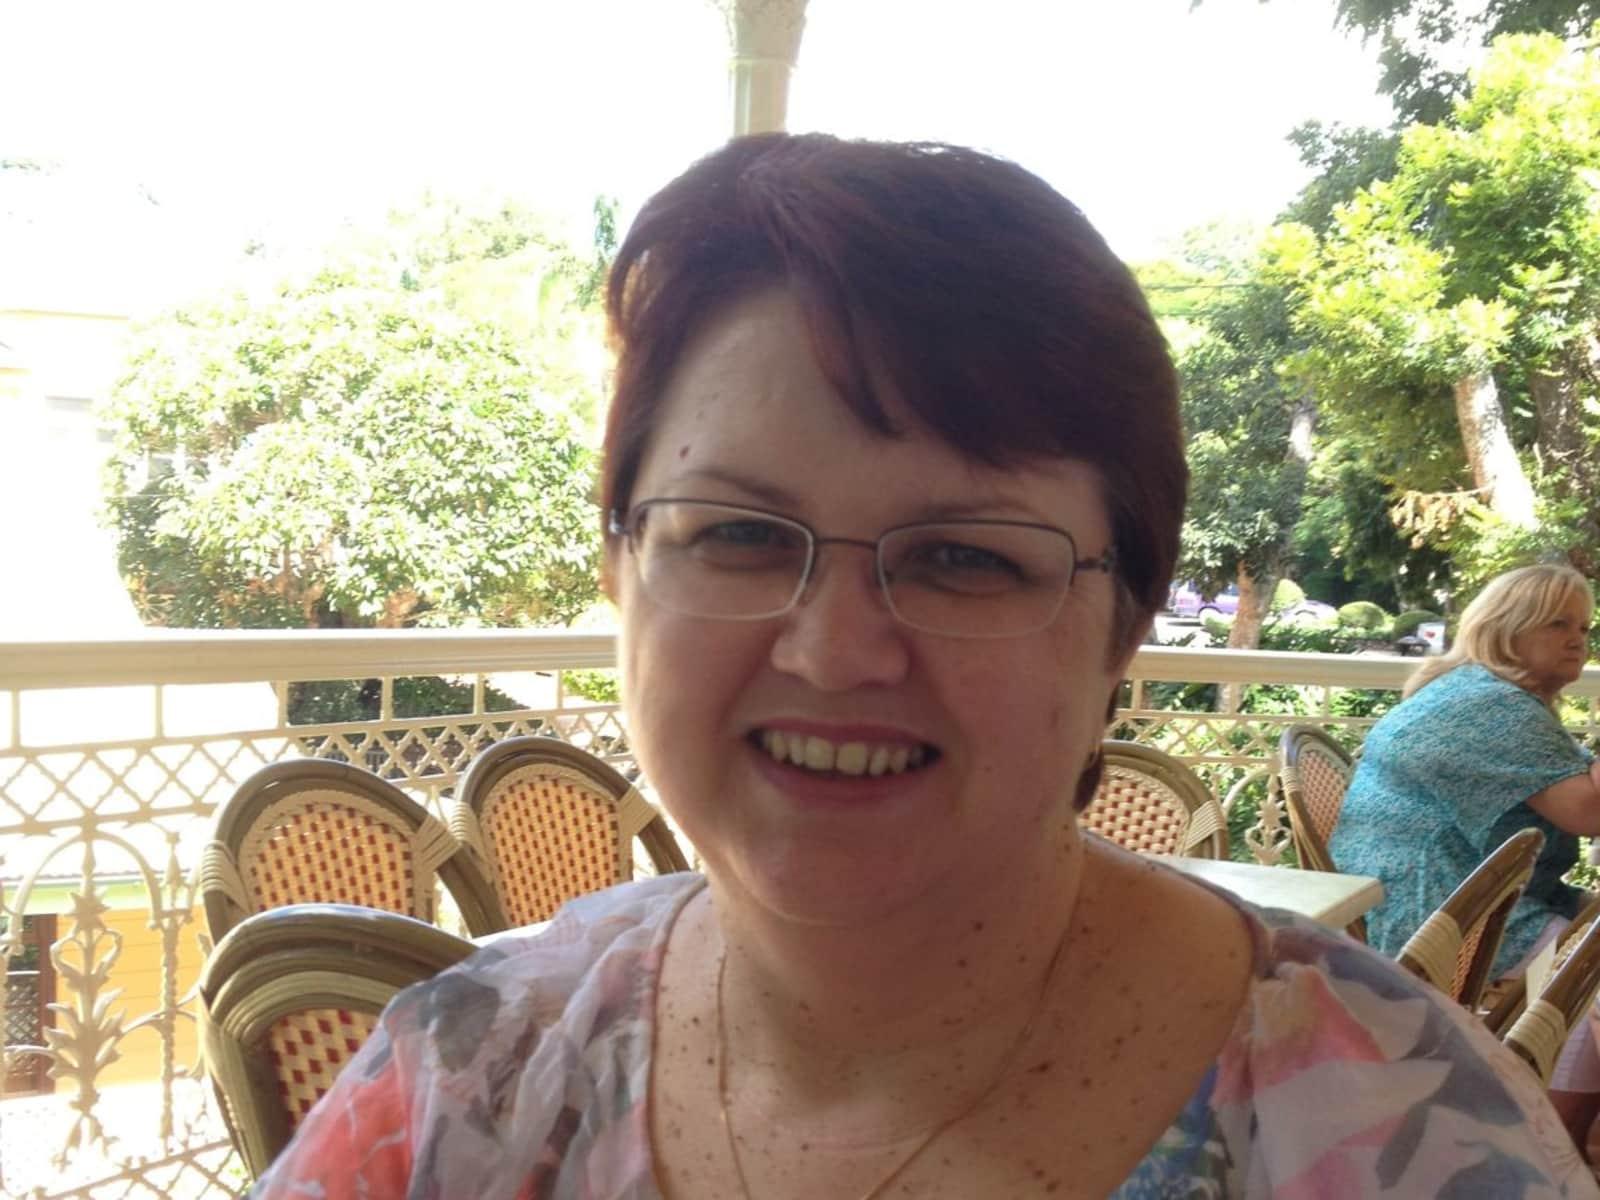 Ruth from Gold Coast, Queensland, Australia